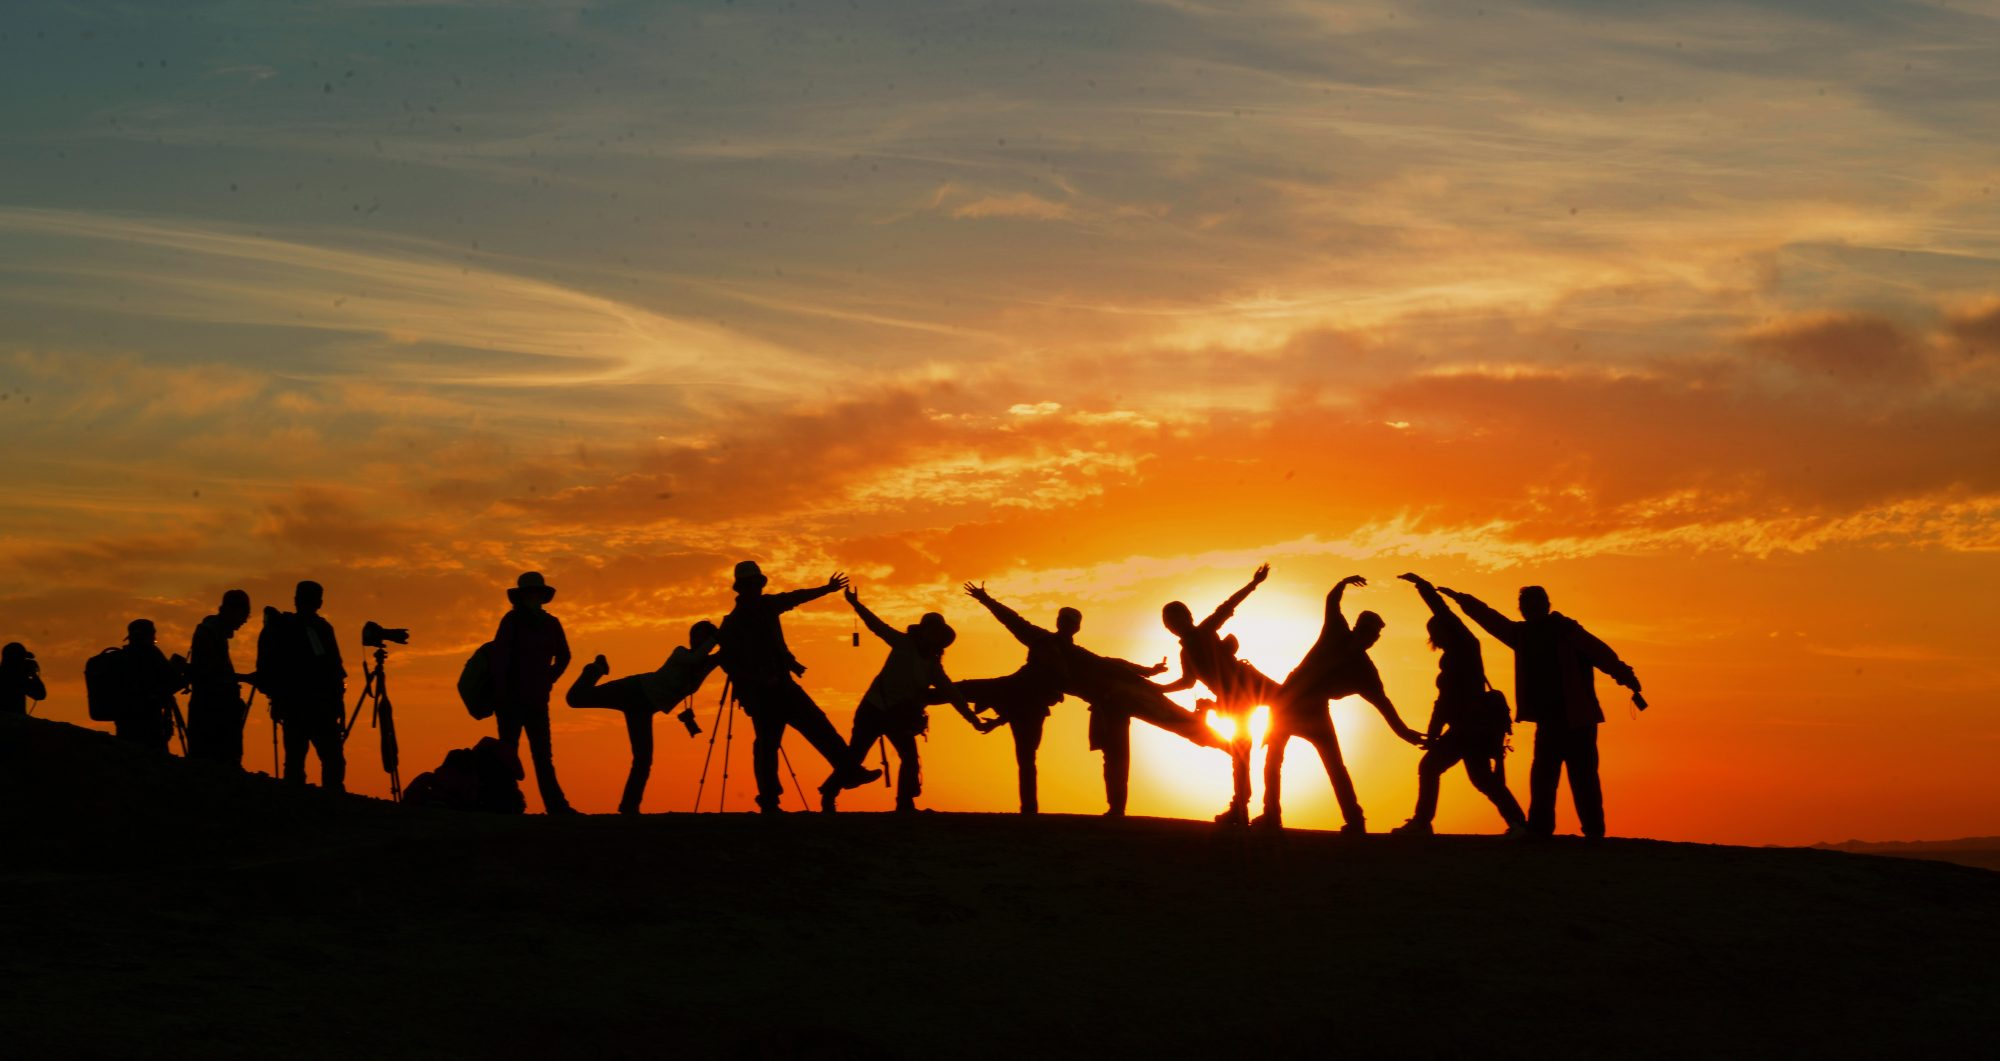 people standing backlit by dusk sky